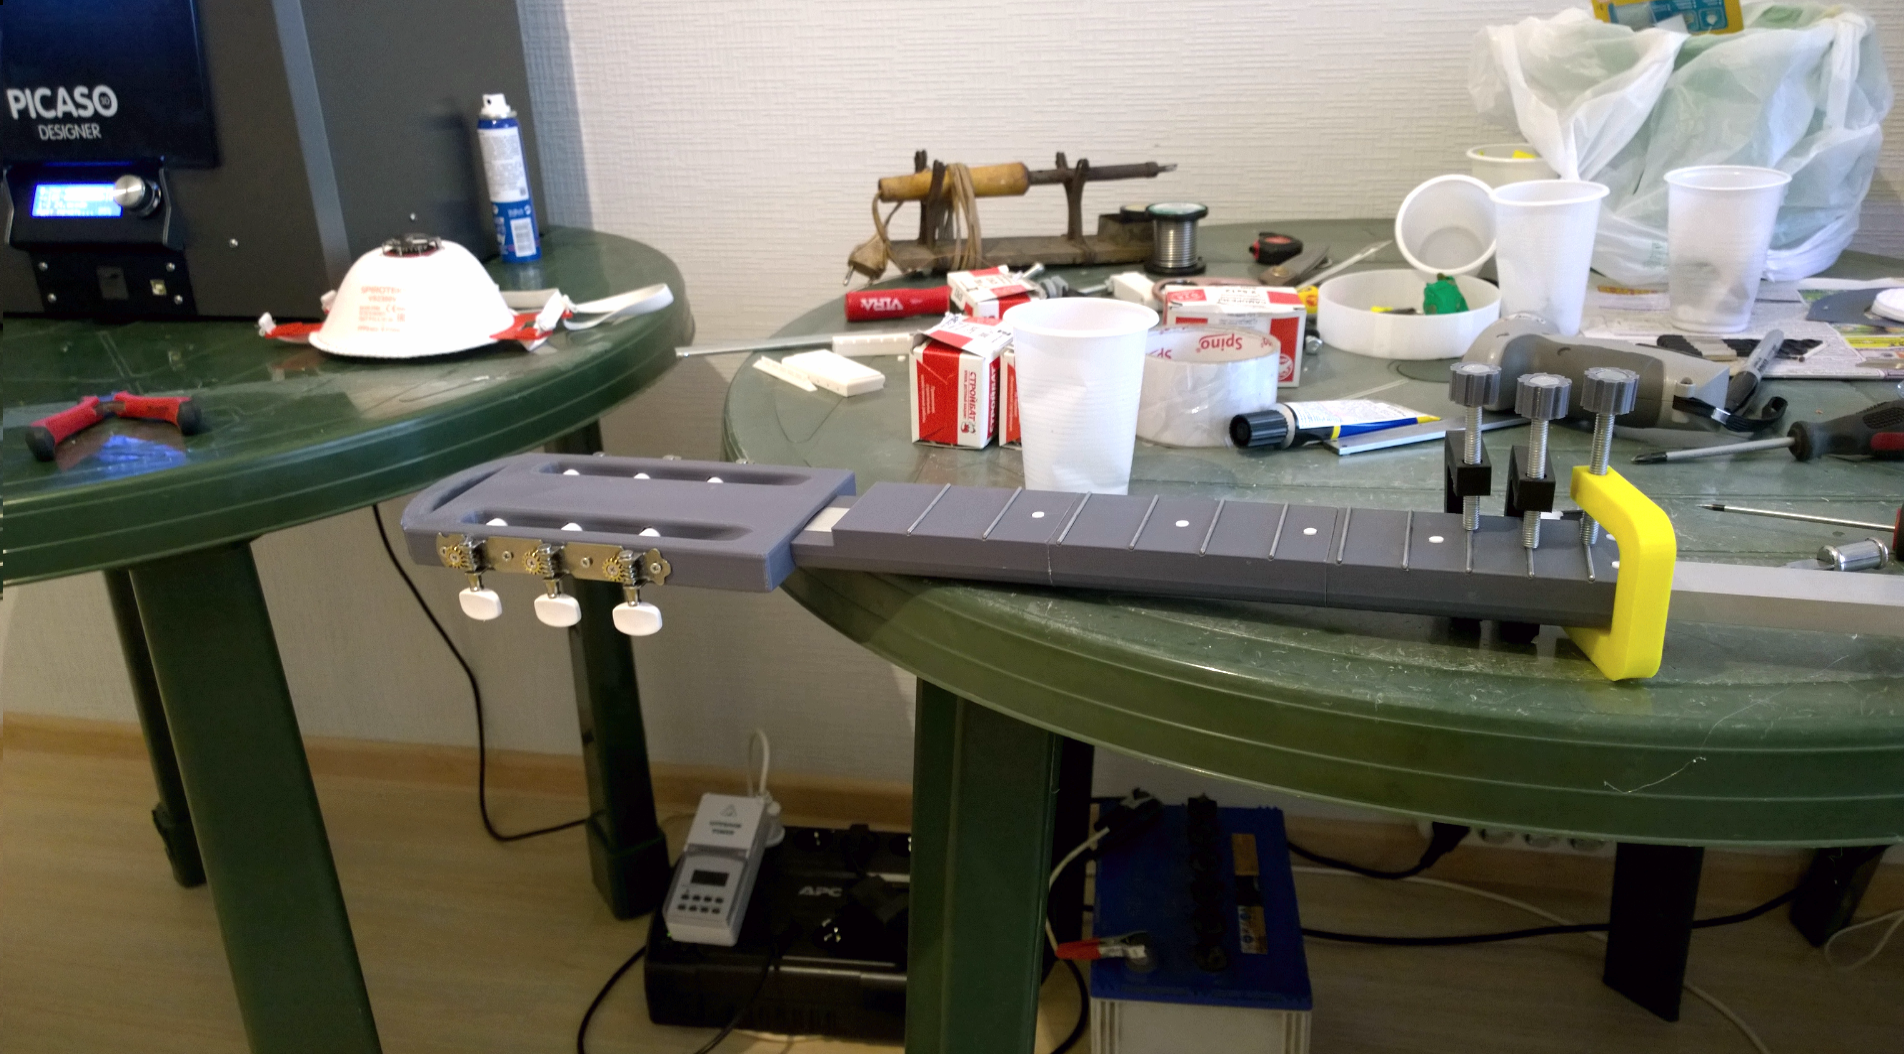 11.png Download free STL file Acoustic guitar with AROMA AG-03M amplifier • 3D printer model, CrocodileGene3d